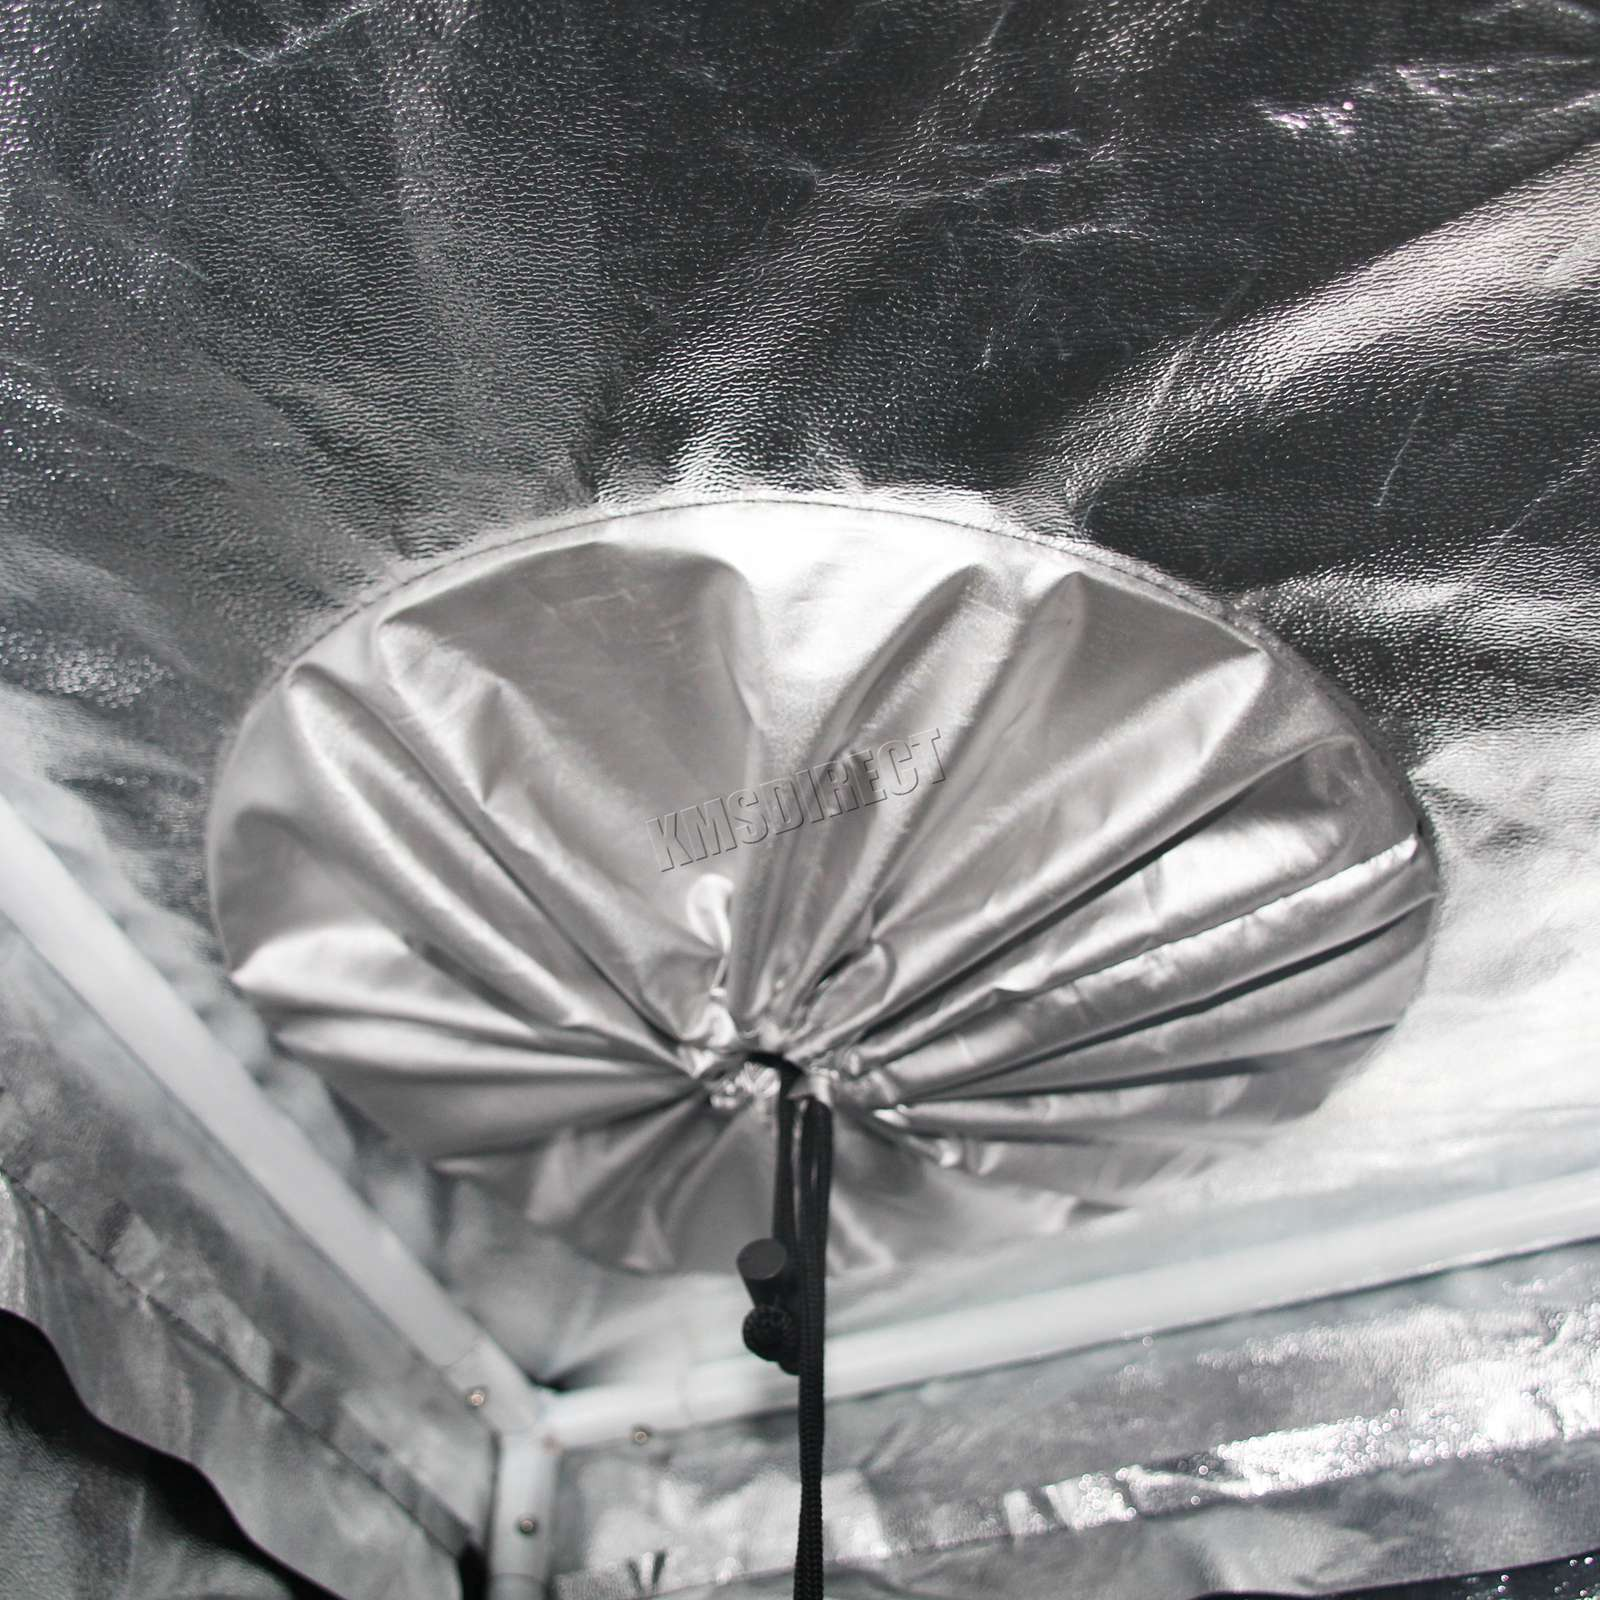 Indoor-Portable-Grow-Tent-Box-Silver-Mylar-Hydroponics-Bud-Green-Room-New-Design miniatuur 27